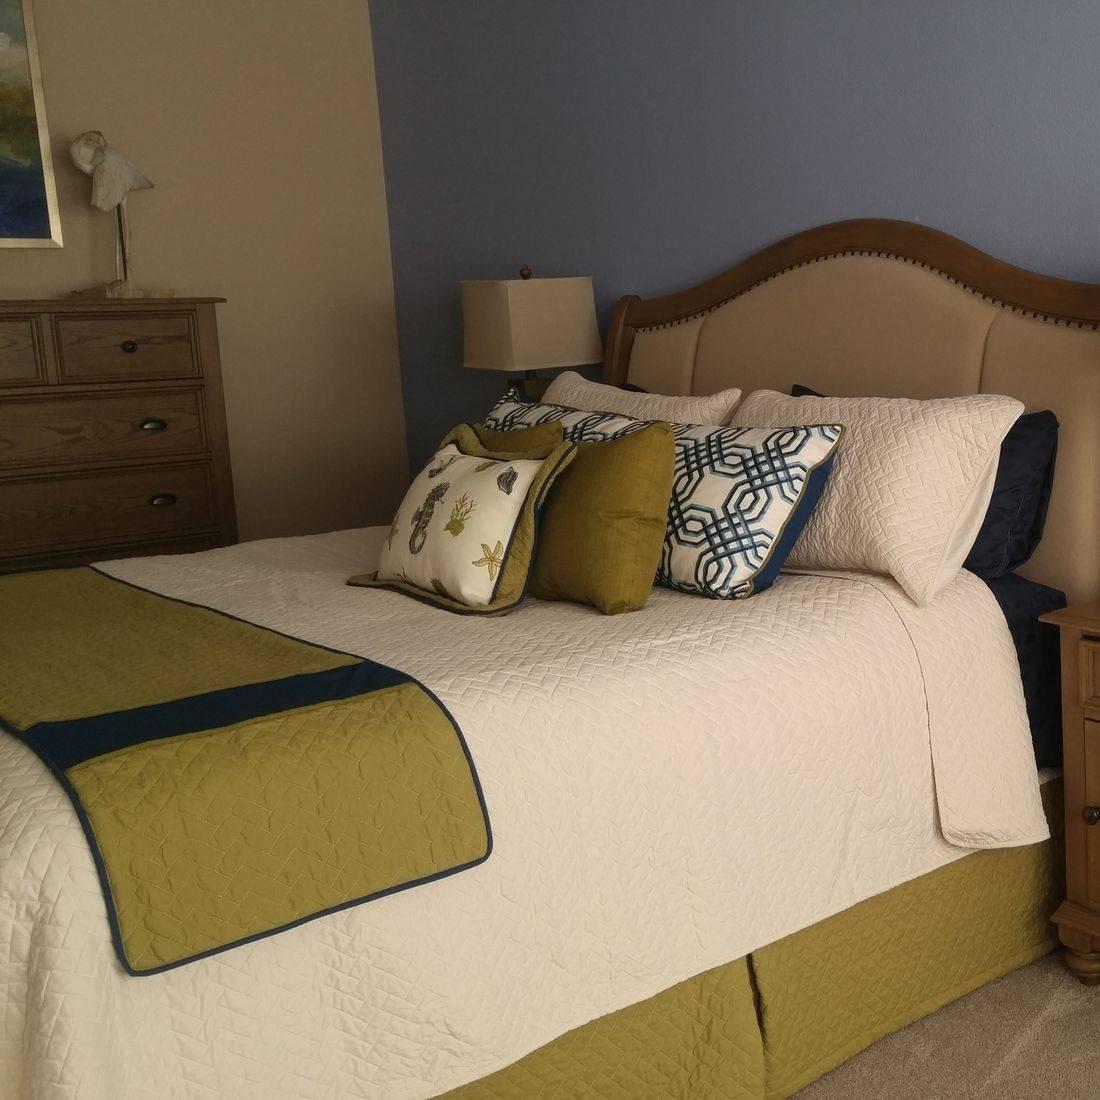 Home Enhancing TM., Staging